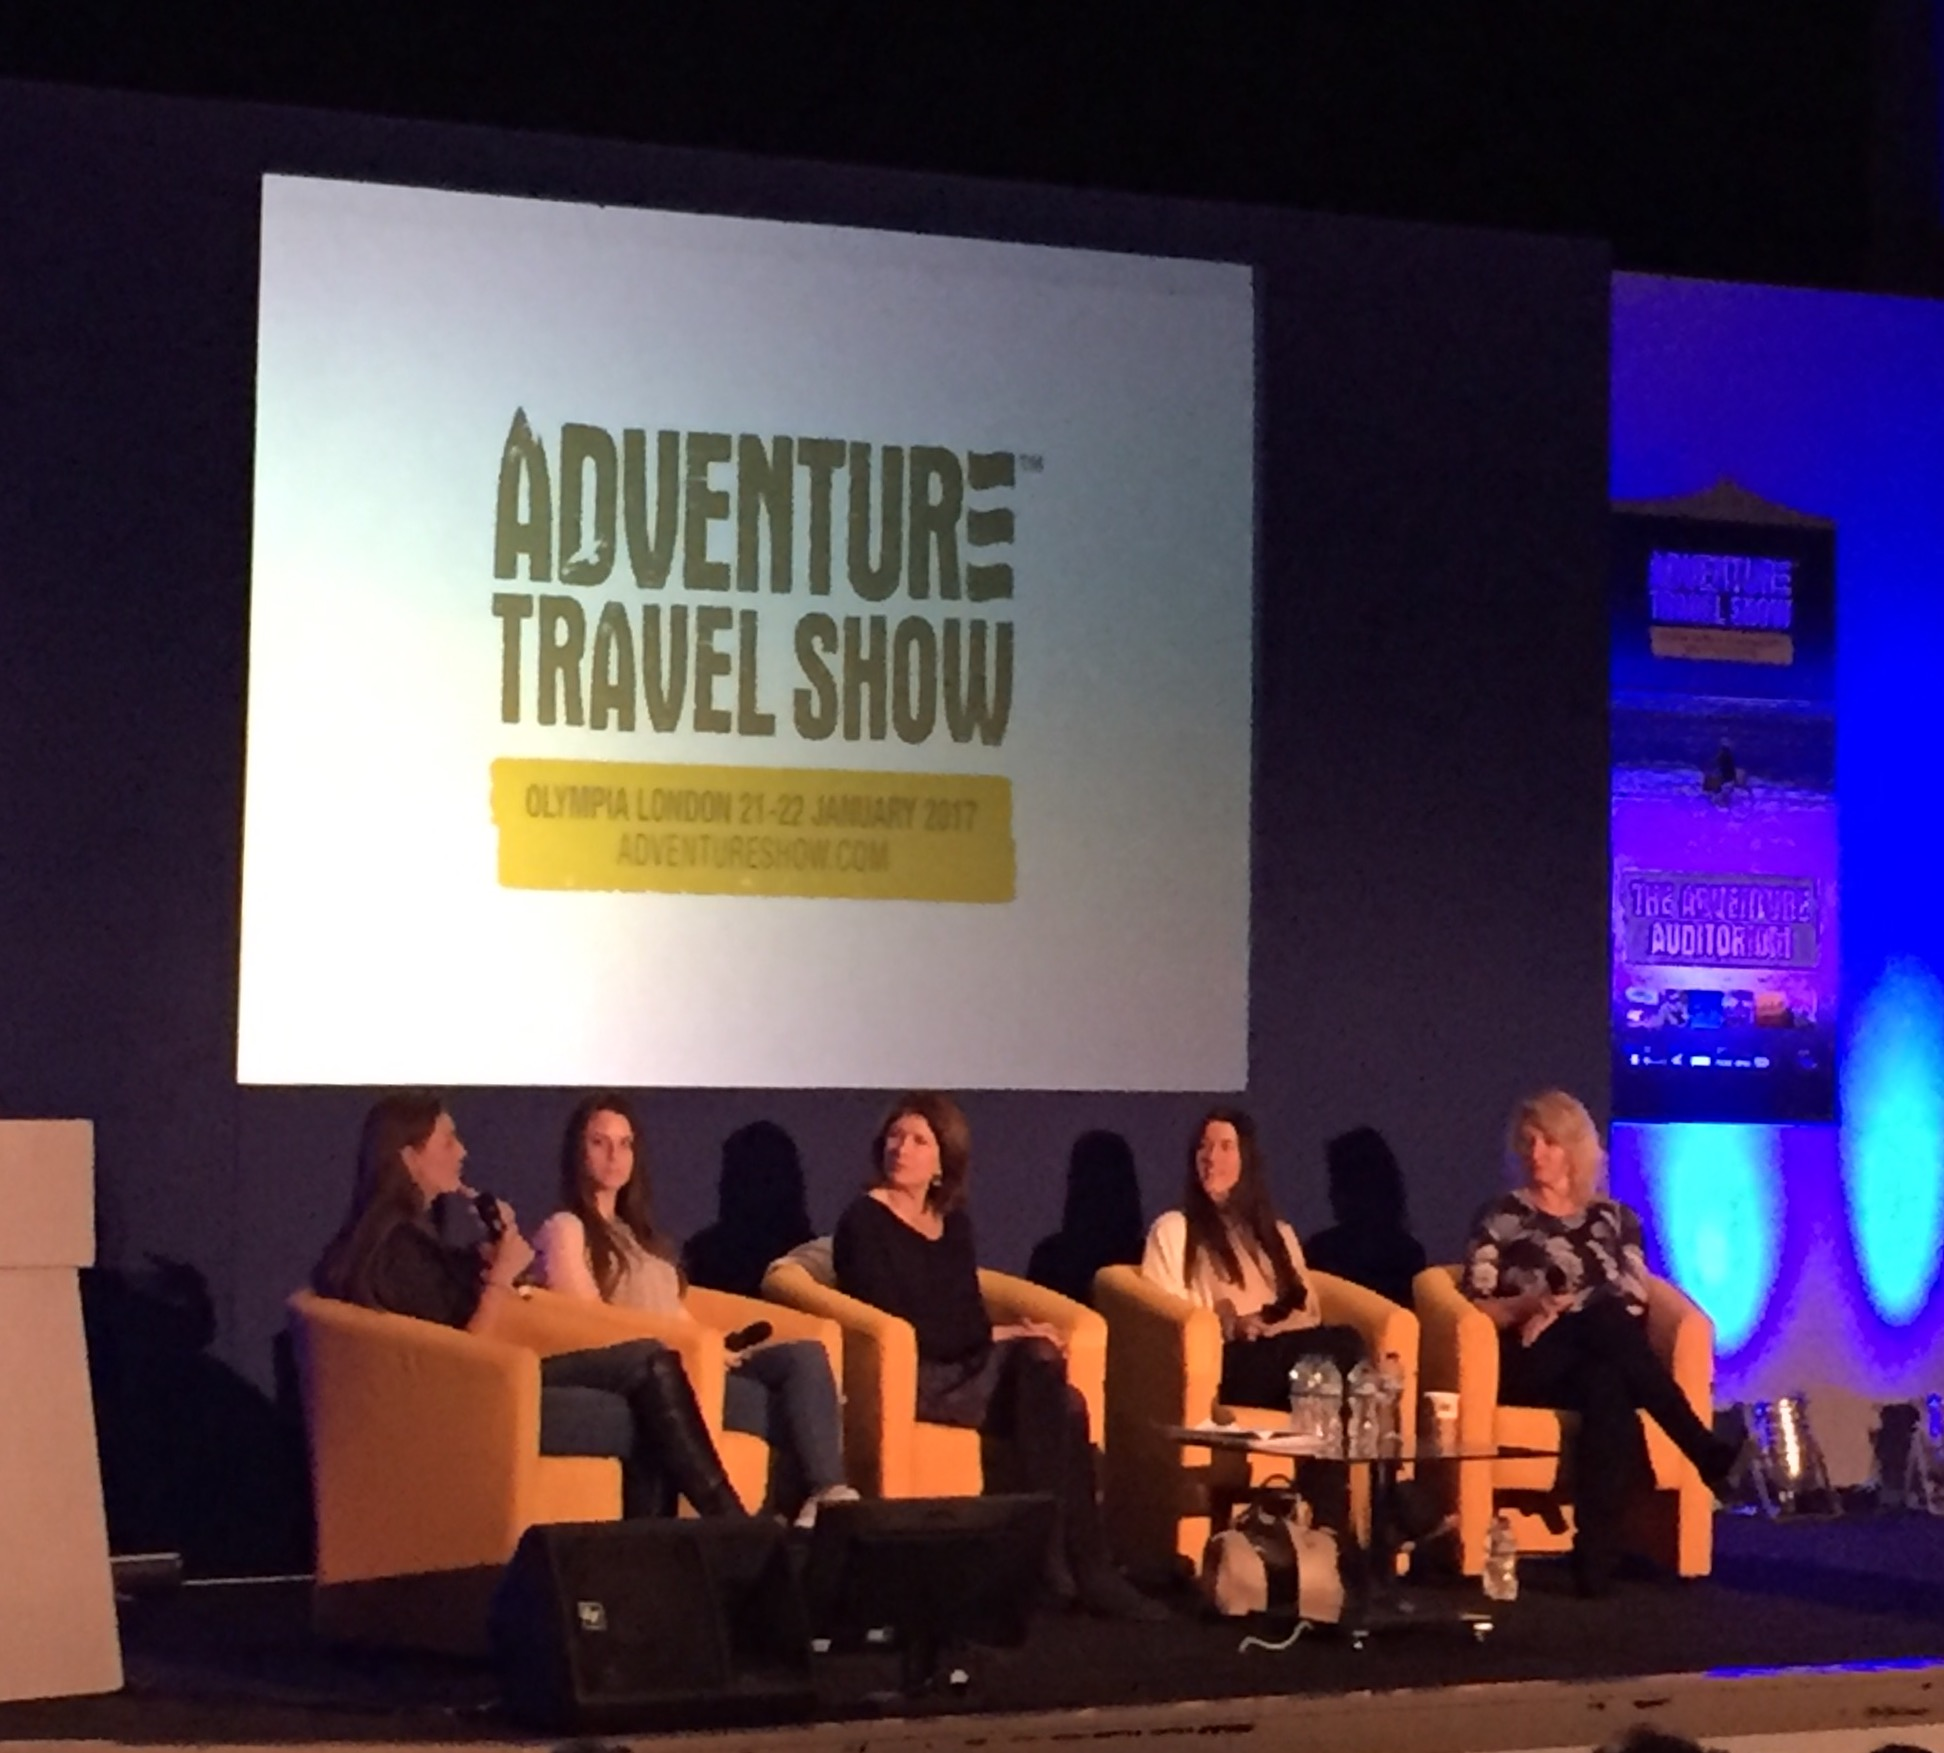 Women on the Edge: Laura Bingham, Justine Gosling, Rebecca Stephens, Natalia Cohen, and Paula Reid (left to right)